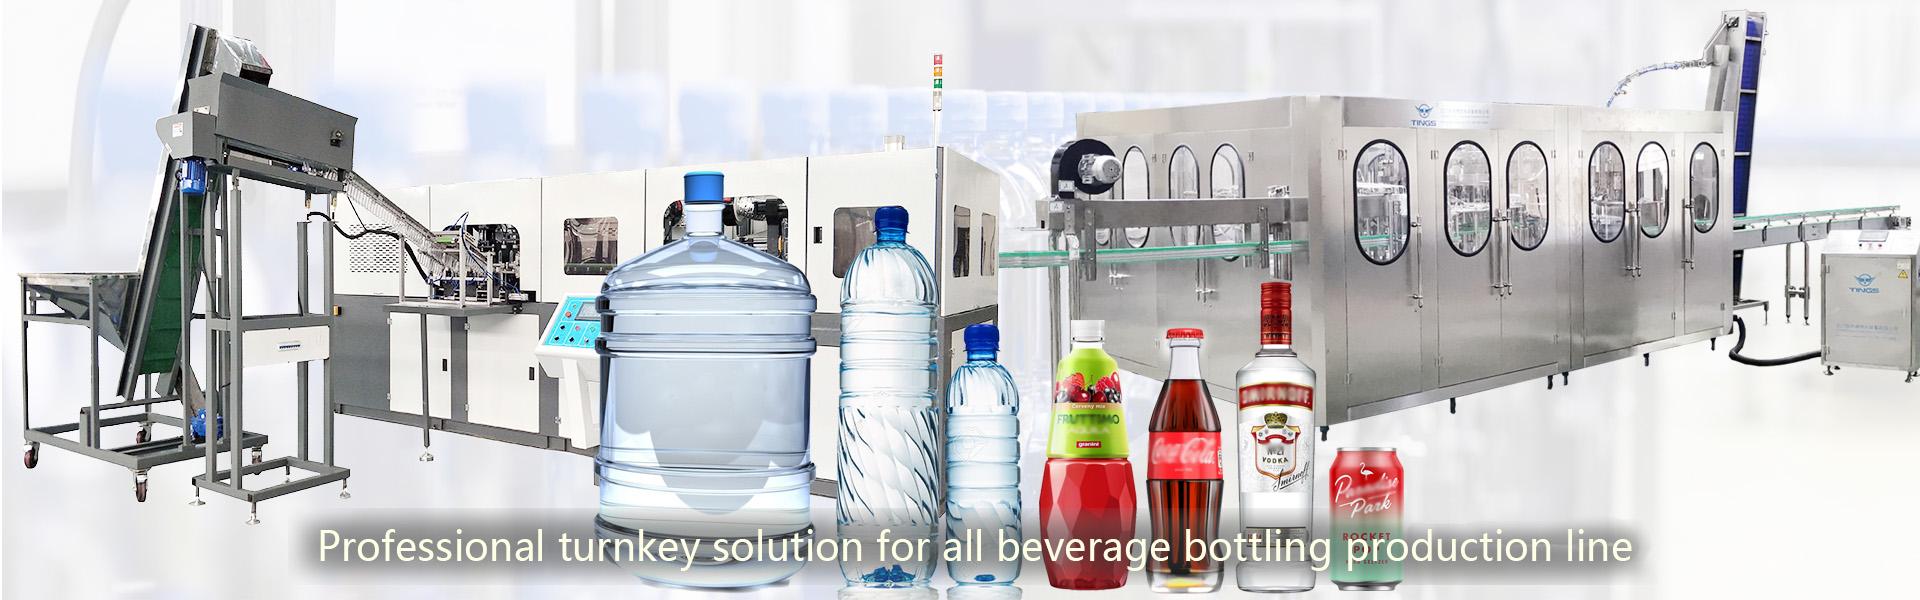 05 Professional Turnkey Solution For All Beverage Bottling Production Line